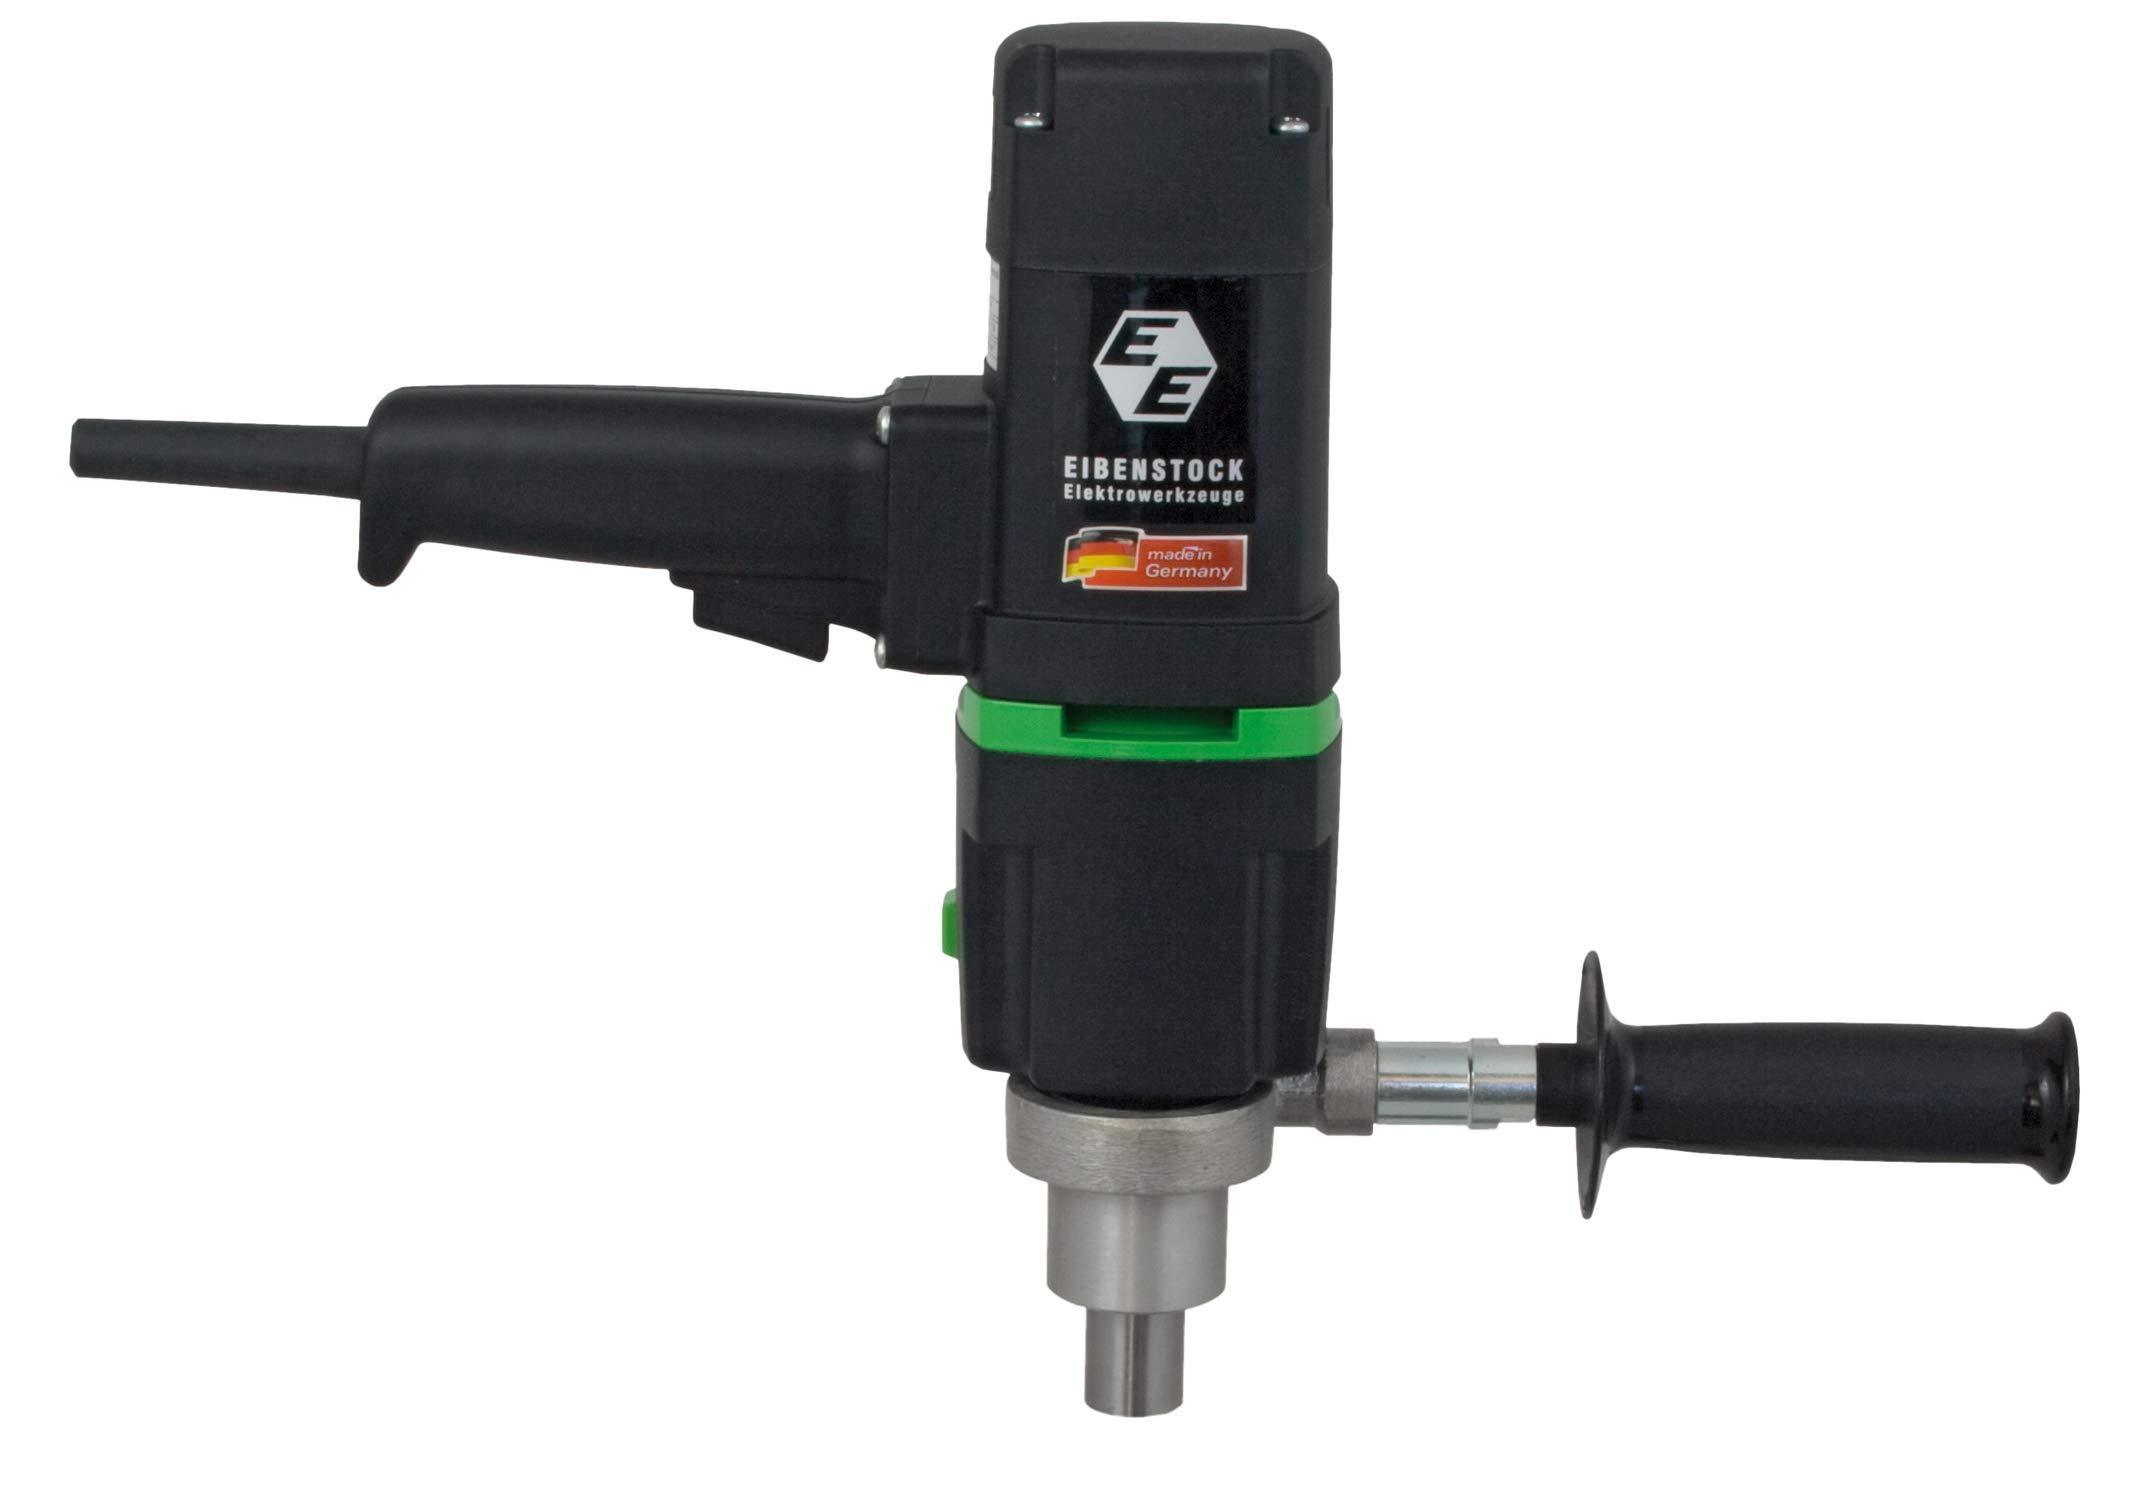 CS Unitec EHB 20/2.4 10.5 Amp 220 V Hand-Held Drill/Drill Motor by C.S. Unitec